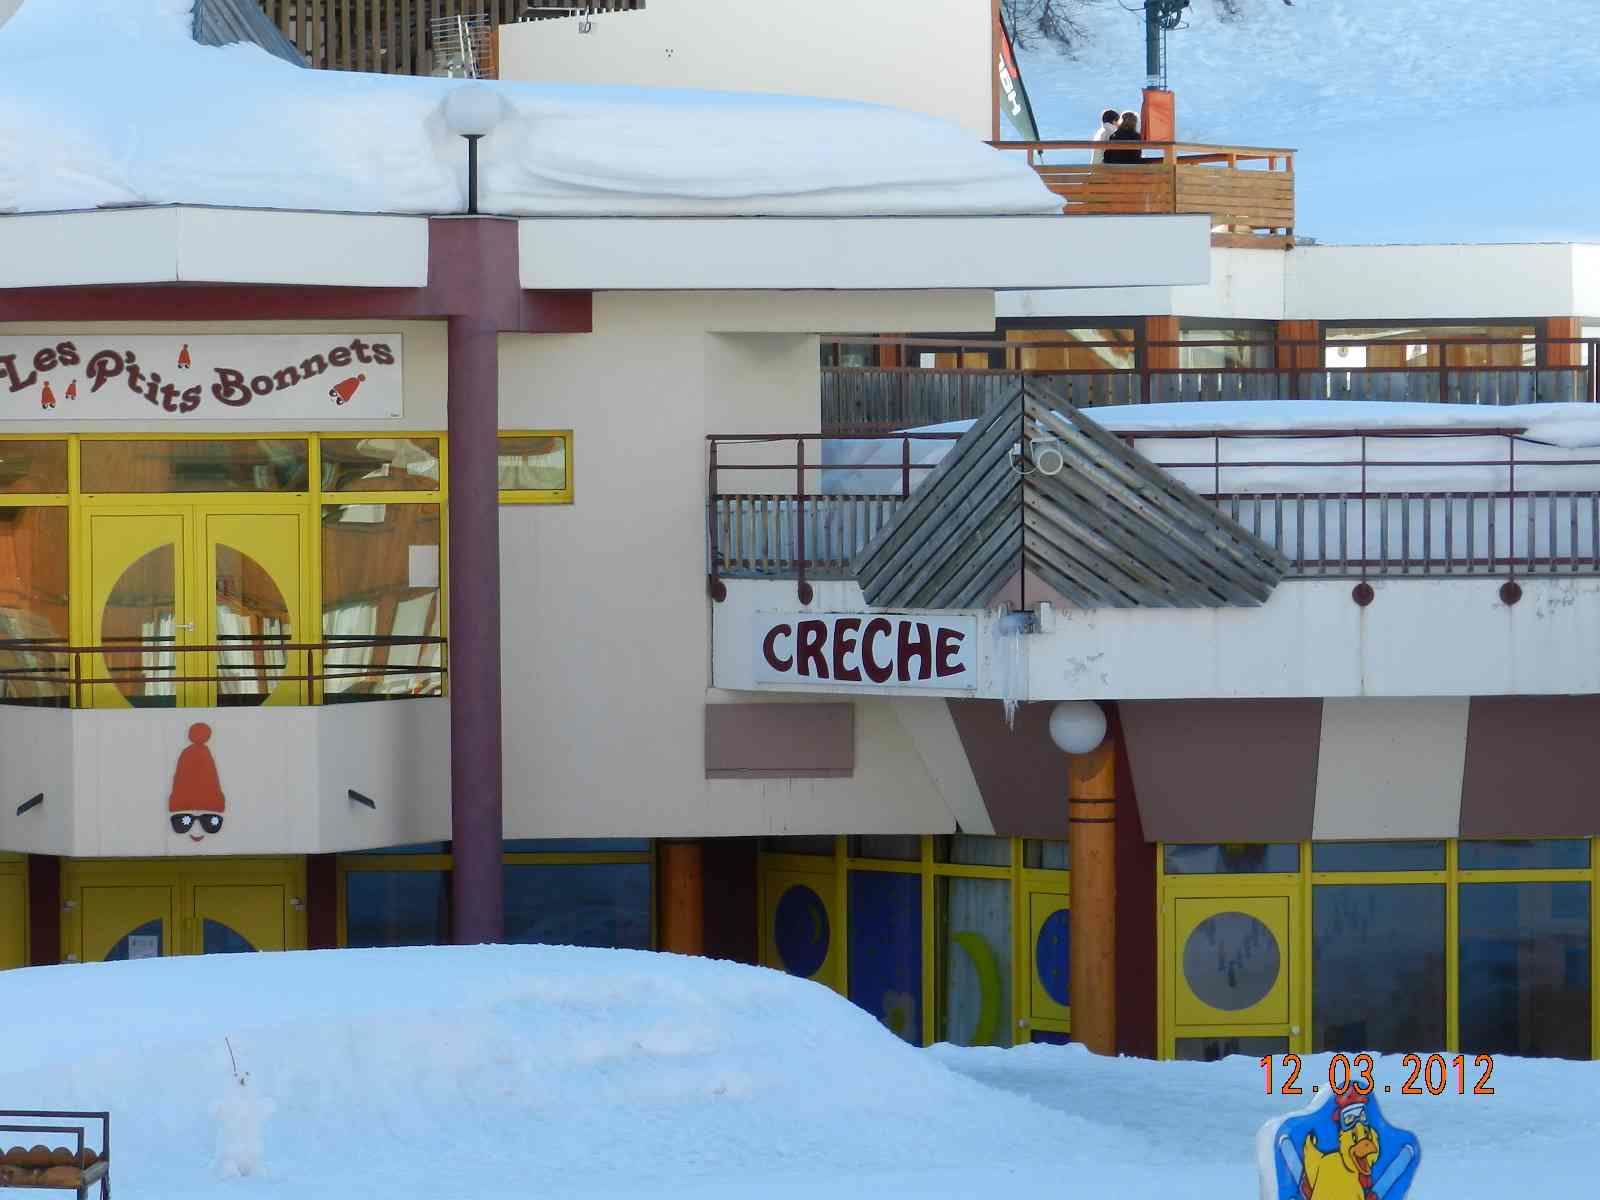 location chalet ski particulier a particulier